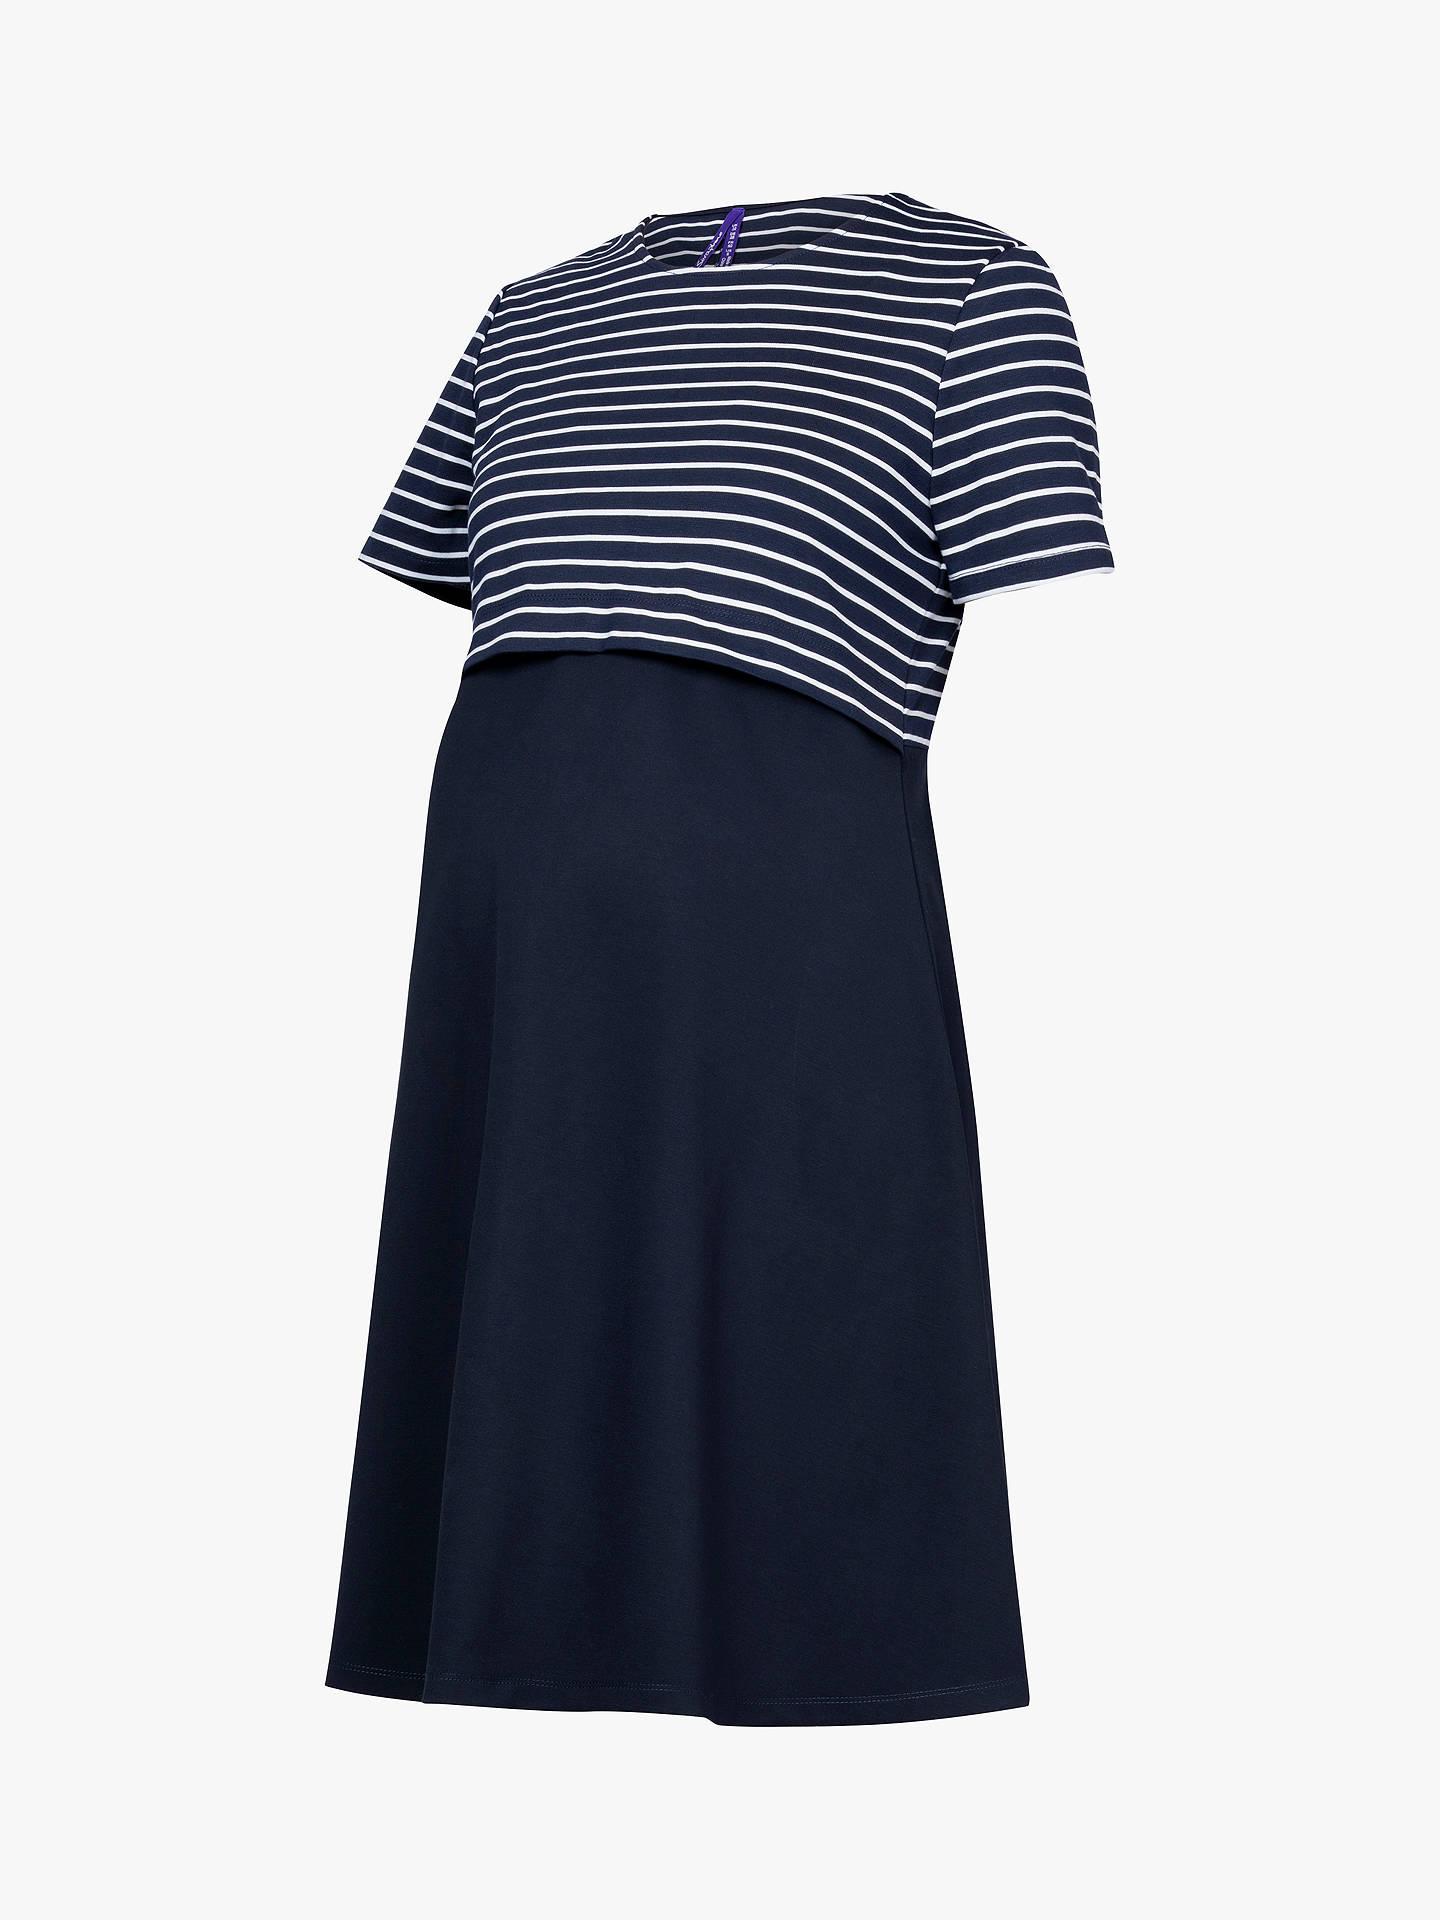 ae95540d08b Buy Séraphine Bethany Maternity Dress